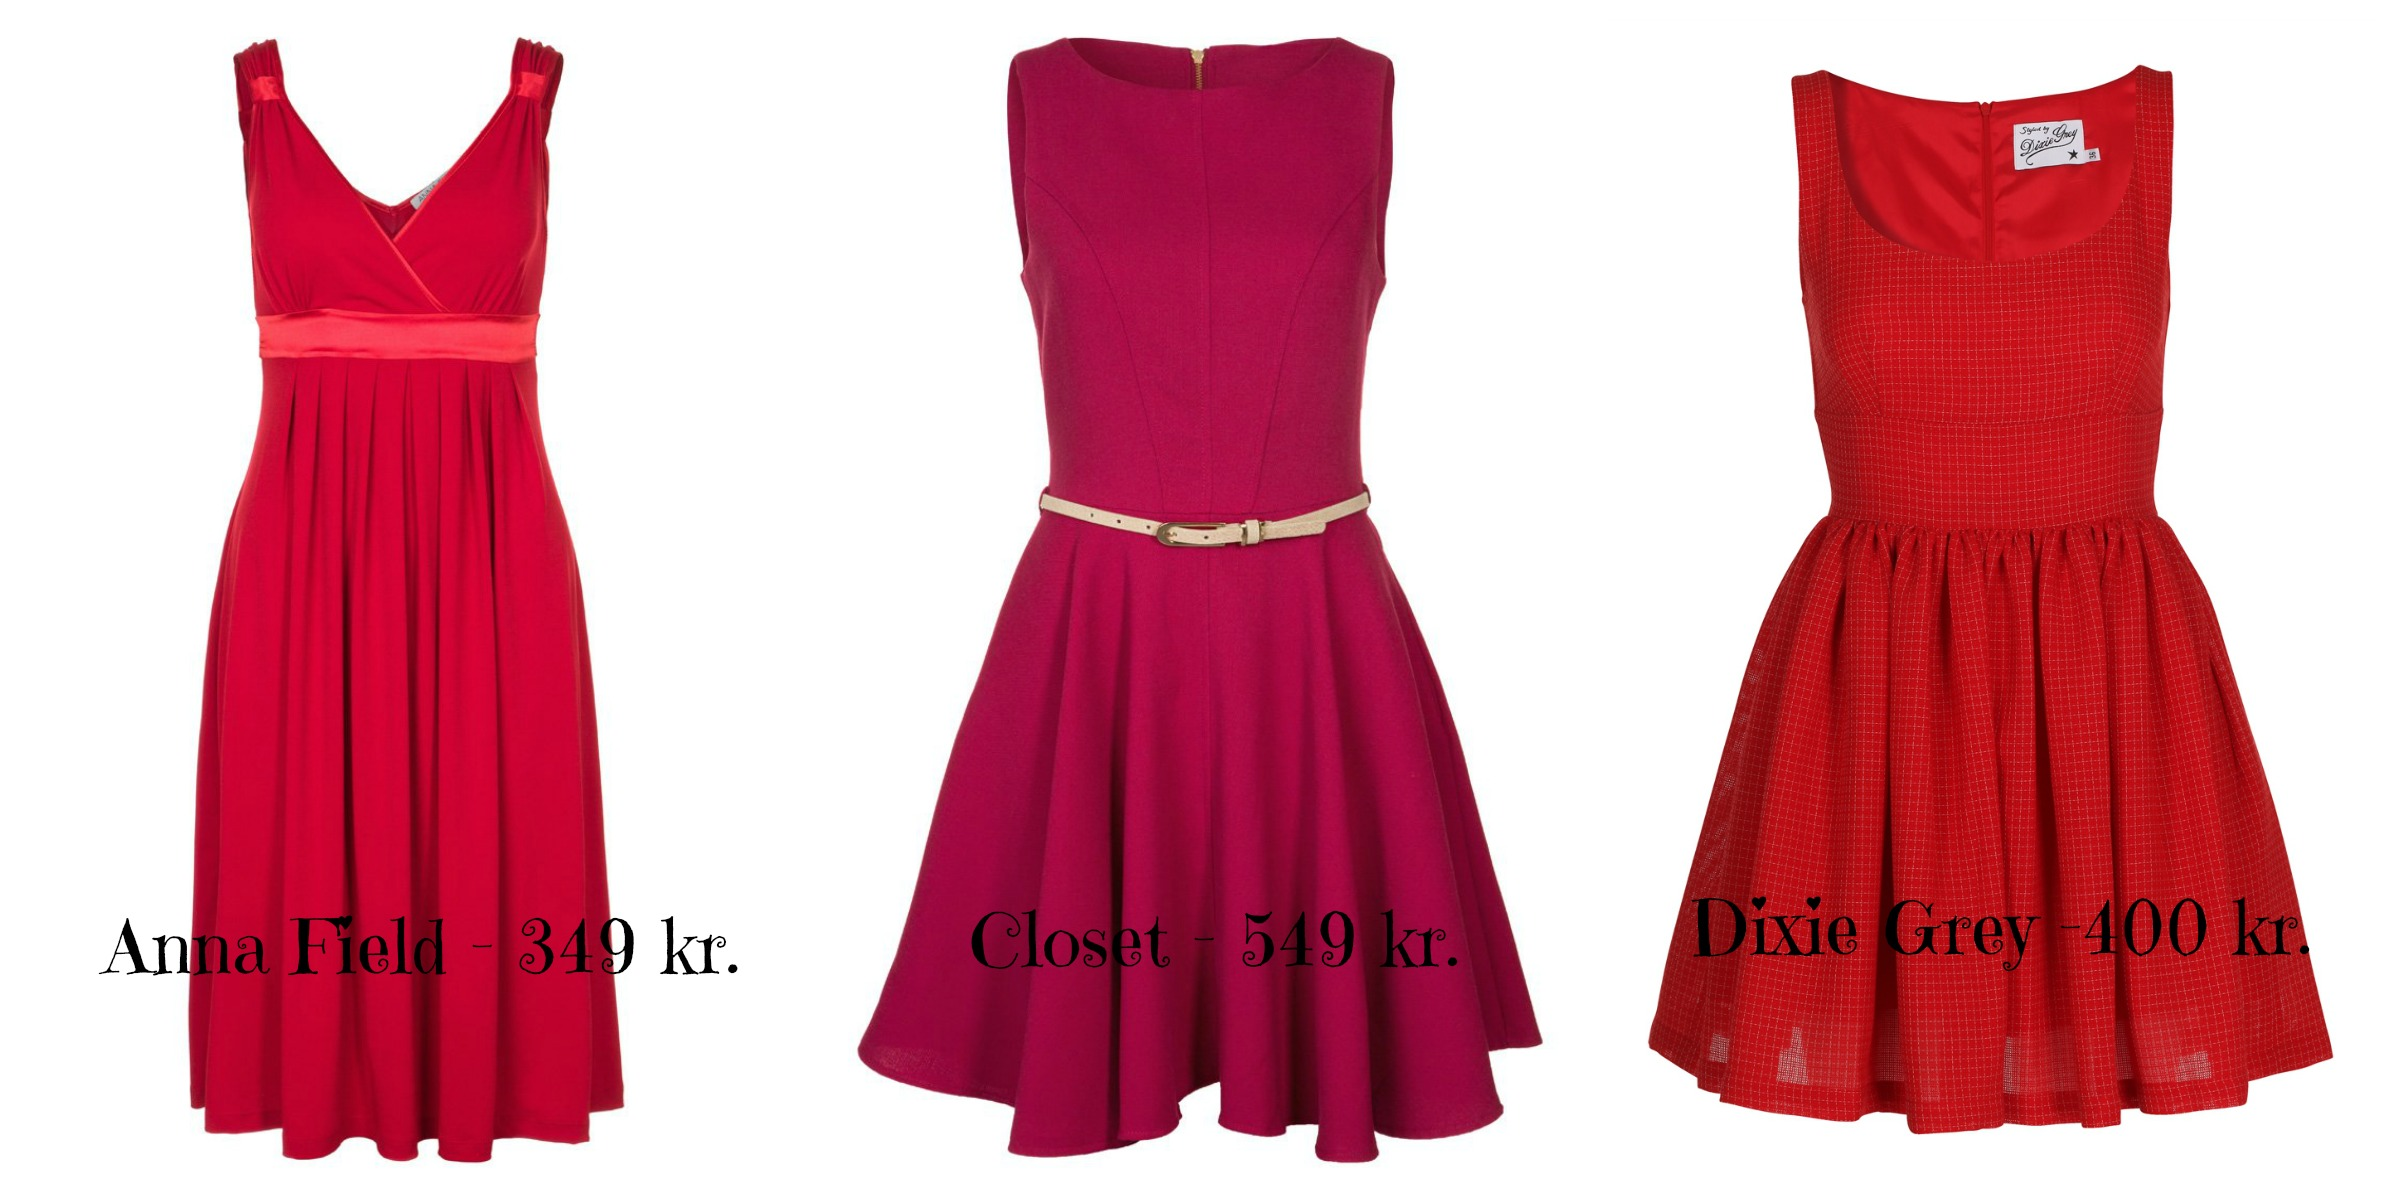 Røde enkle kjoler valentinsday